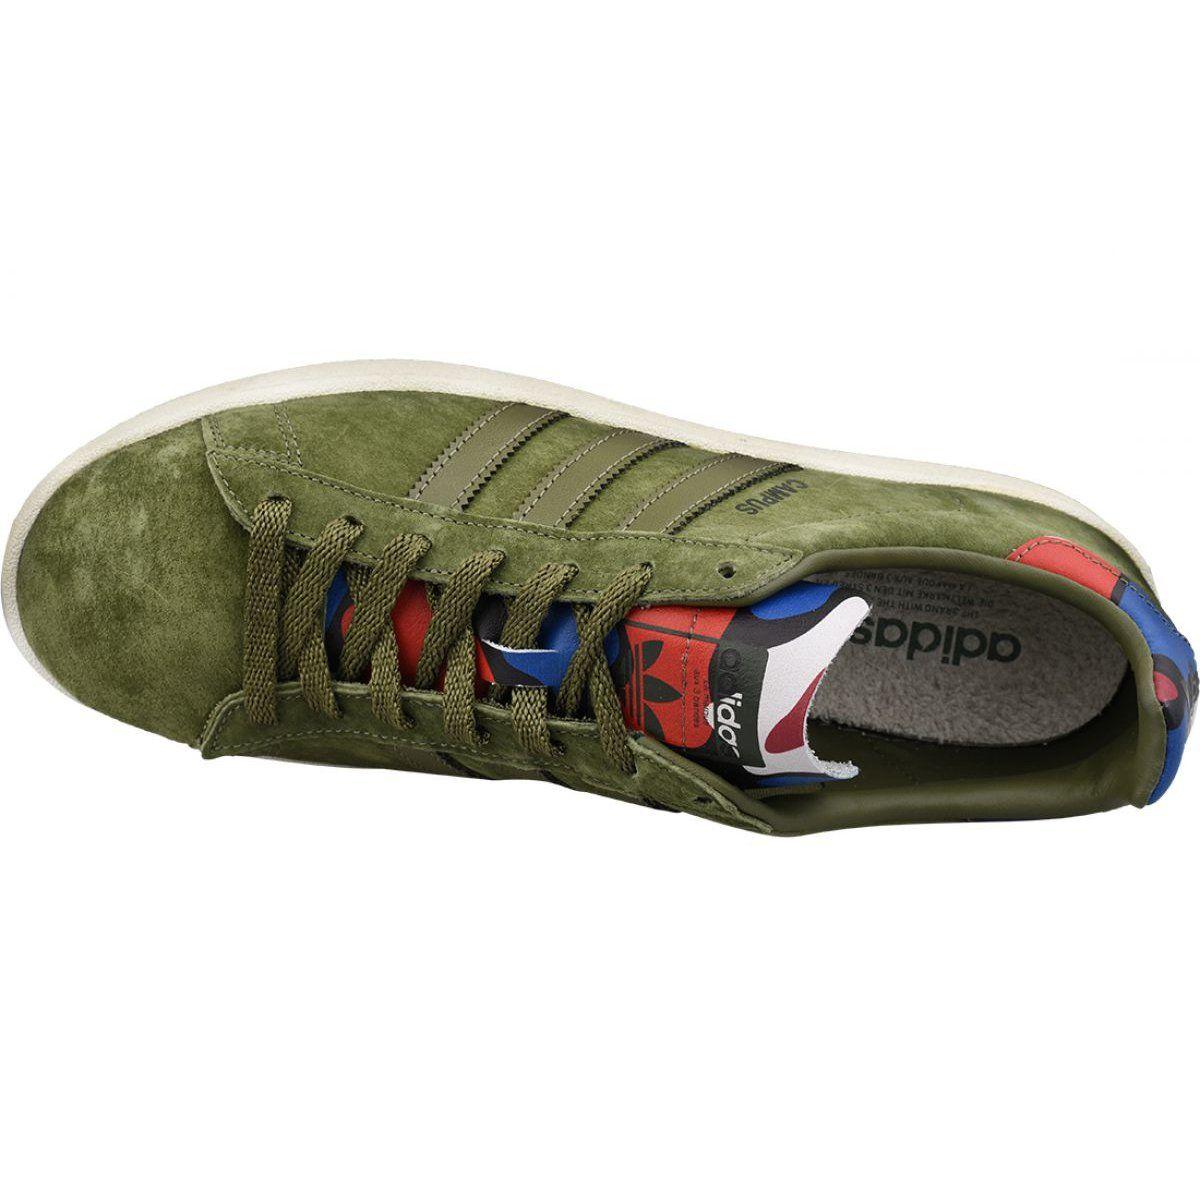 Buty Adidas Campus M Bb0077 Zielone Adidas Campus Shoes Adidas Brand